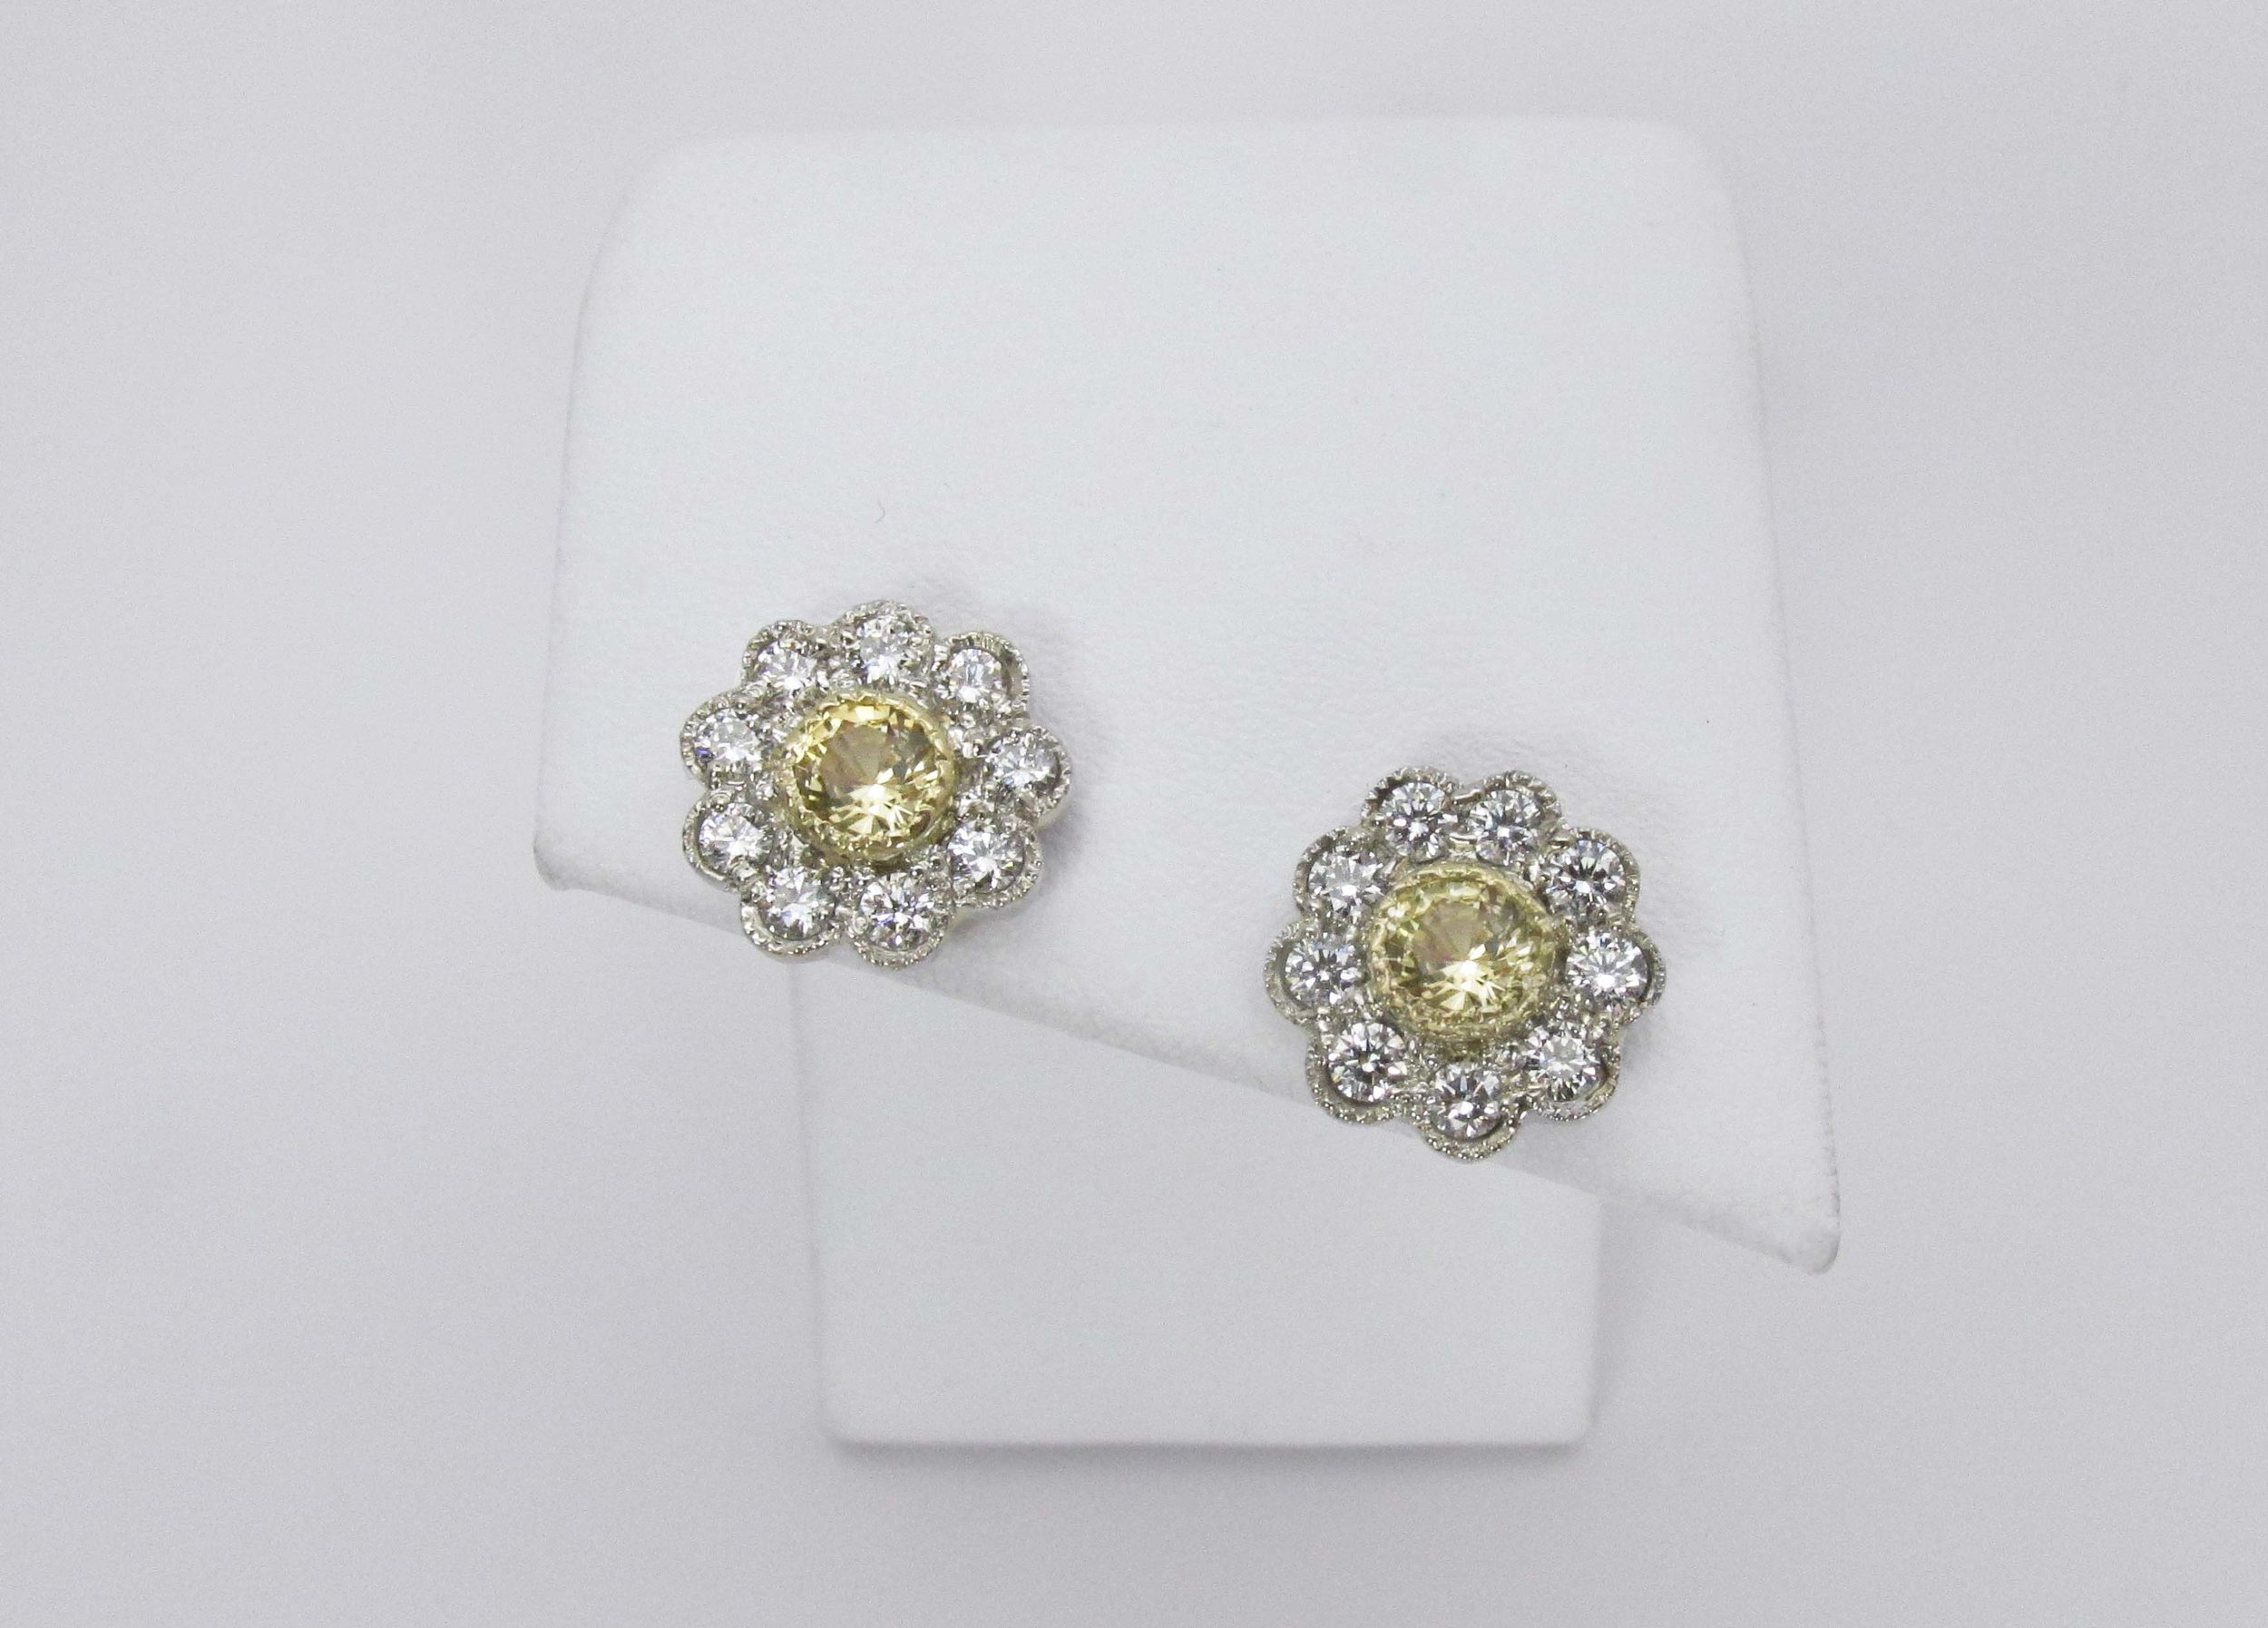 yellow_sapphire_studs_halo_redford_jewelers.jpg